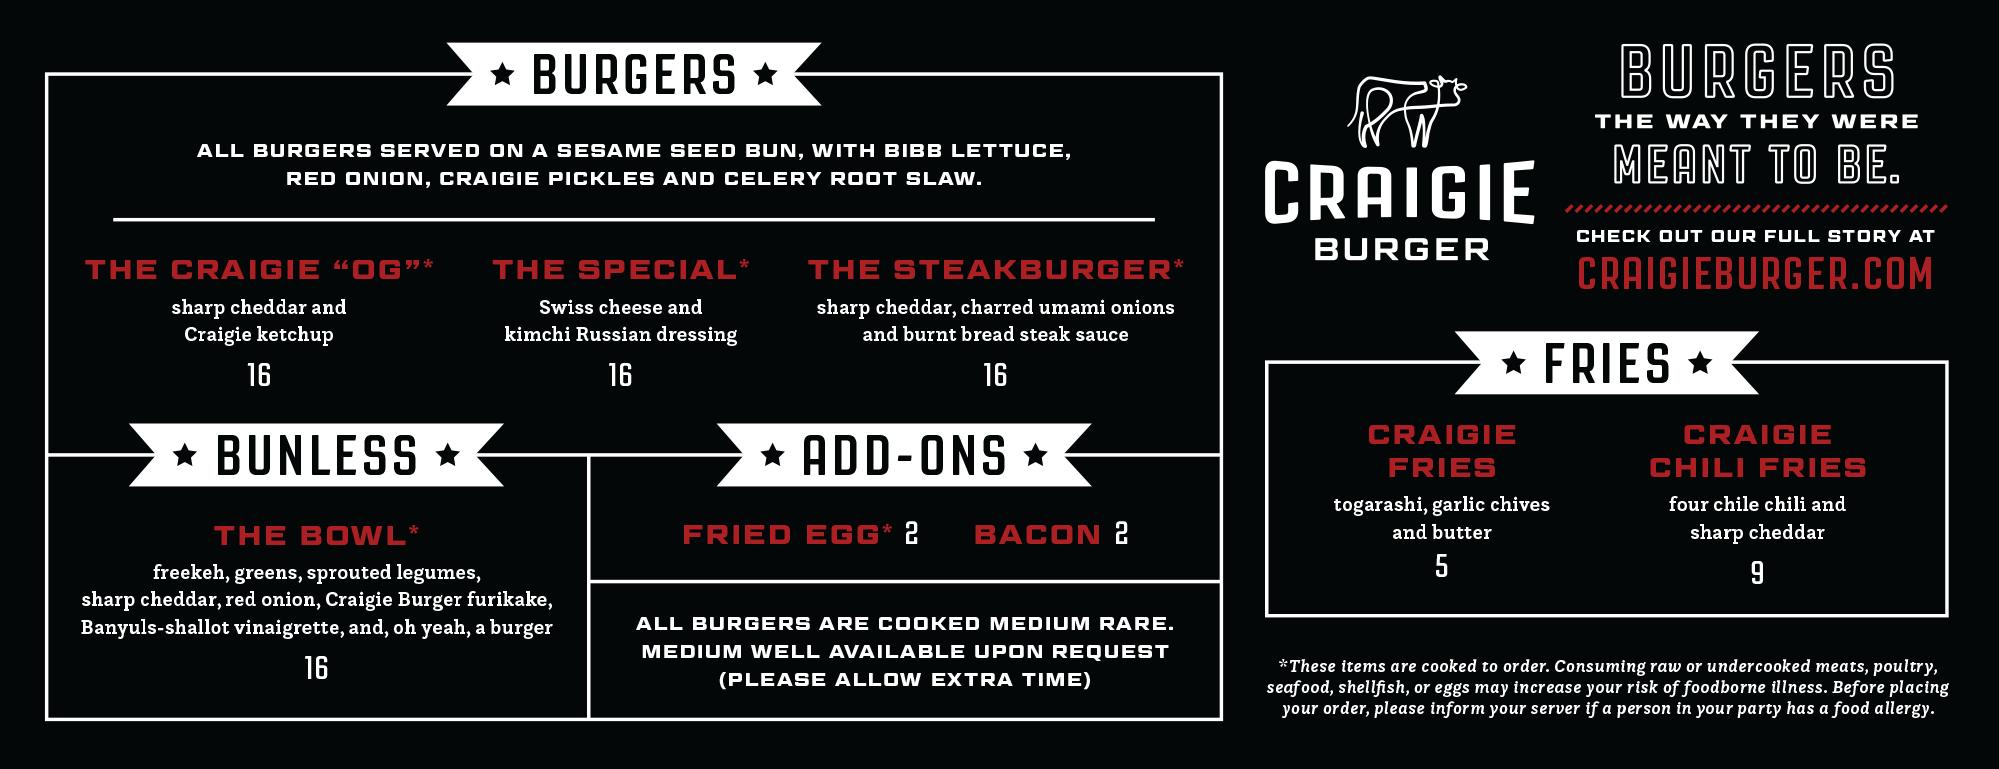 Craigie Burger Menu Board